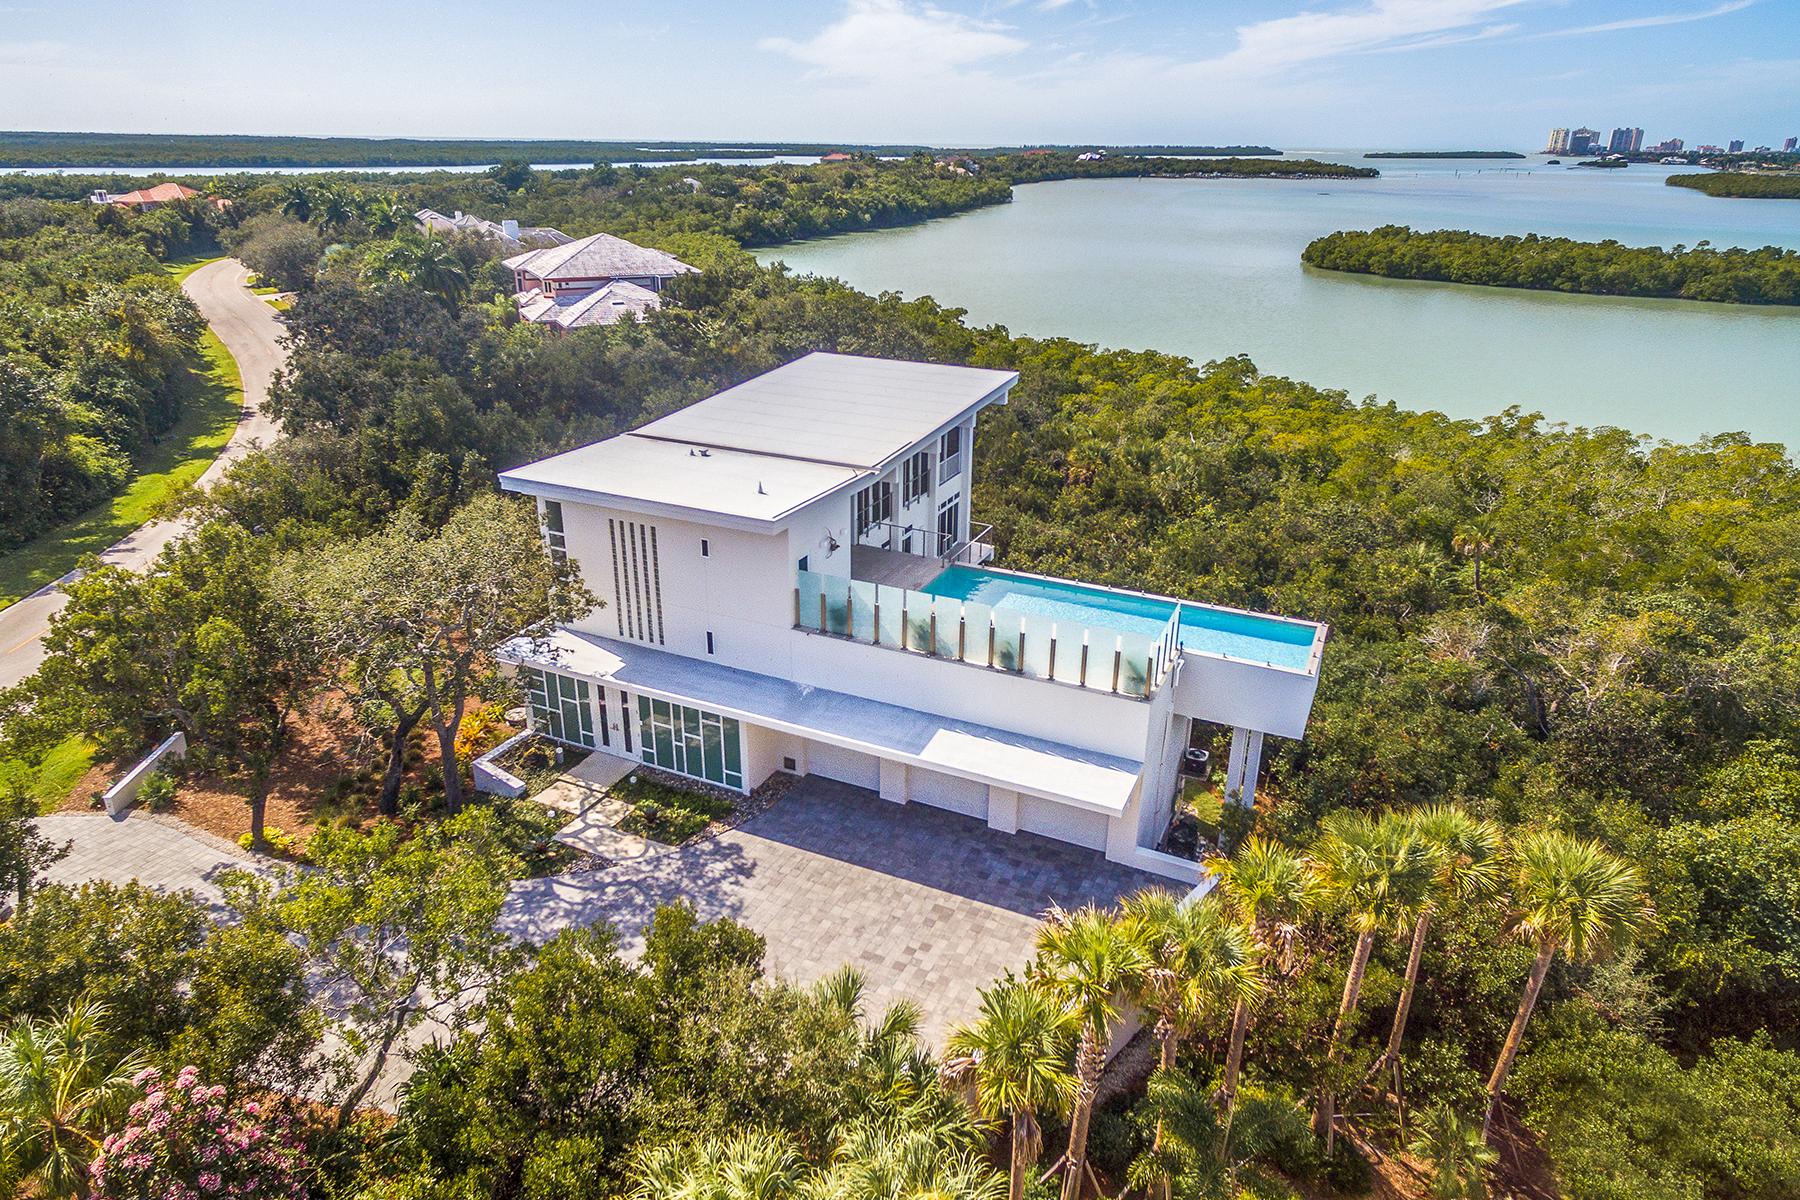 Moradia para Venda às KEY MARCO 1143 Blue Hill Creek Dr Marco Island, Florida, 34145 Estados Unidos